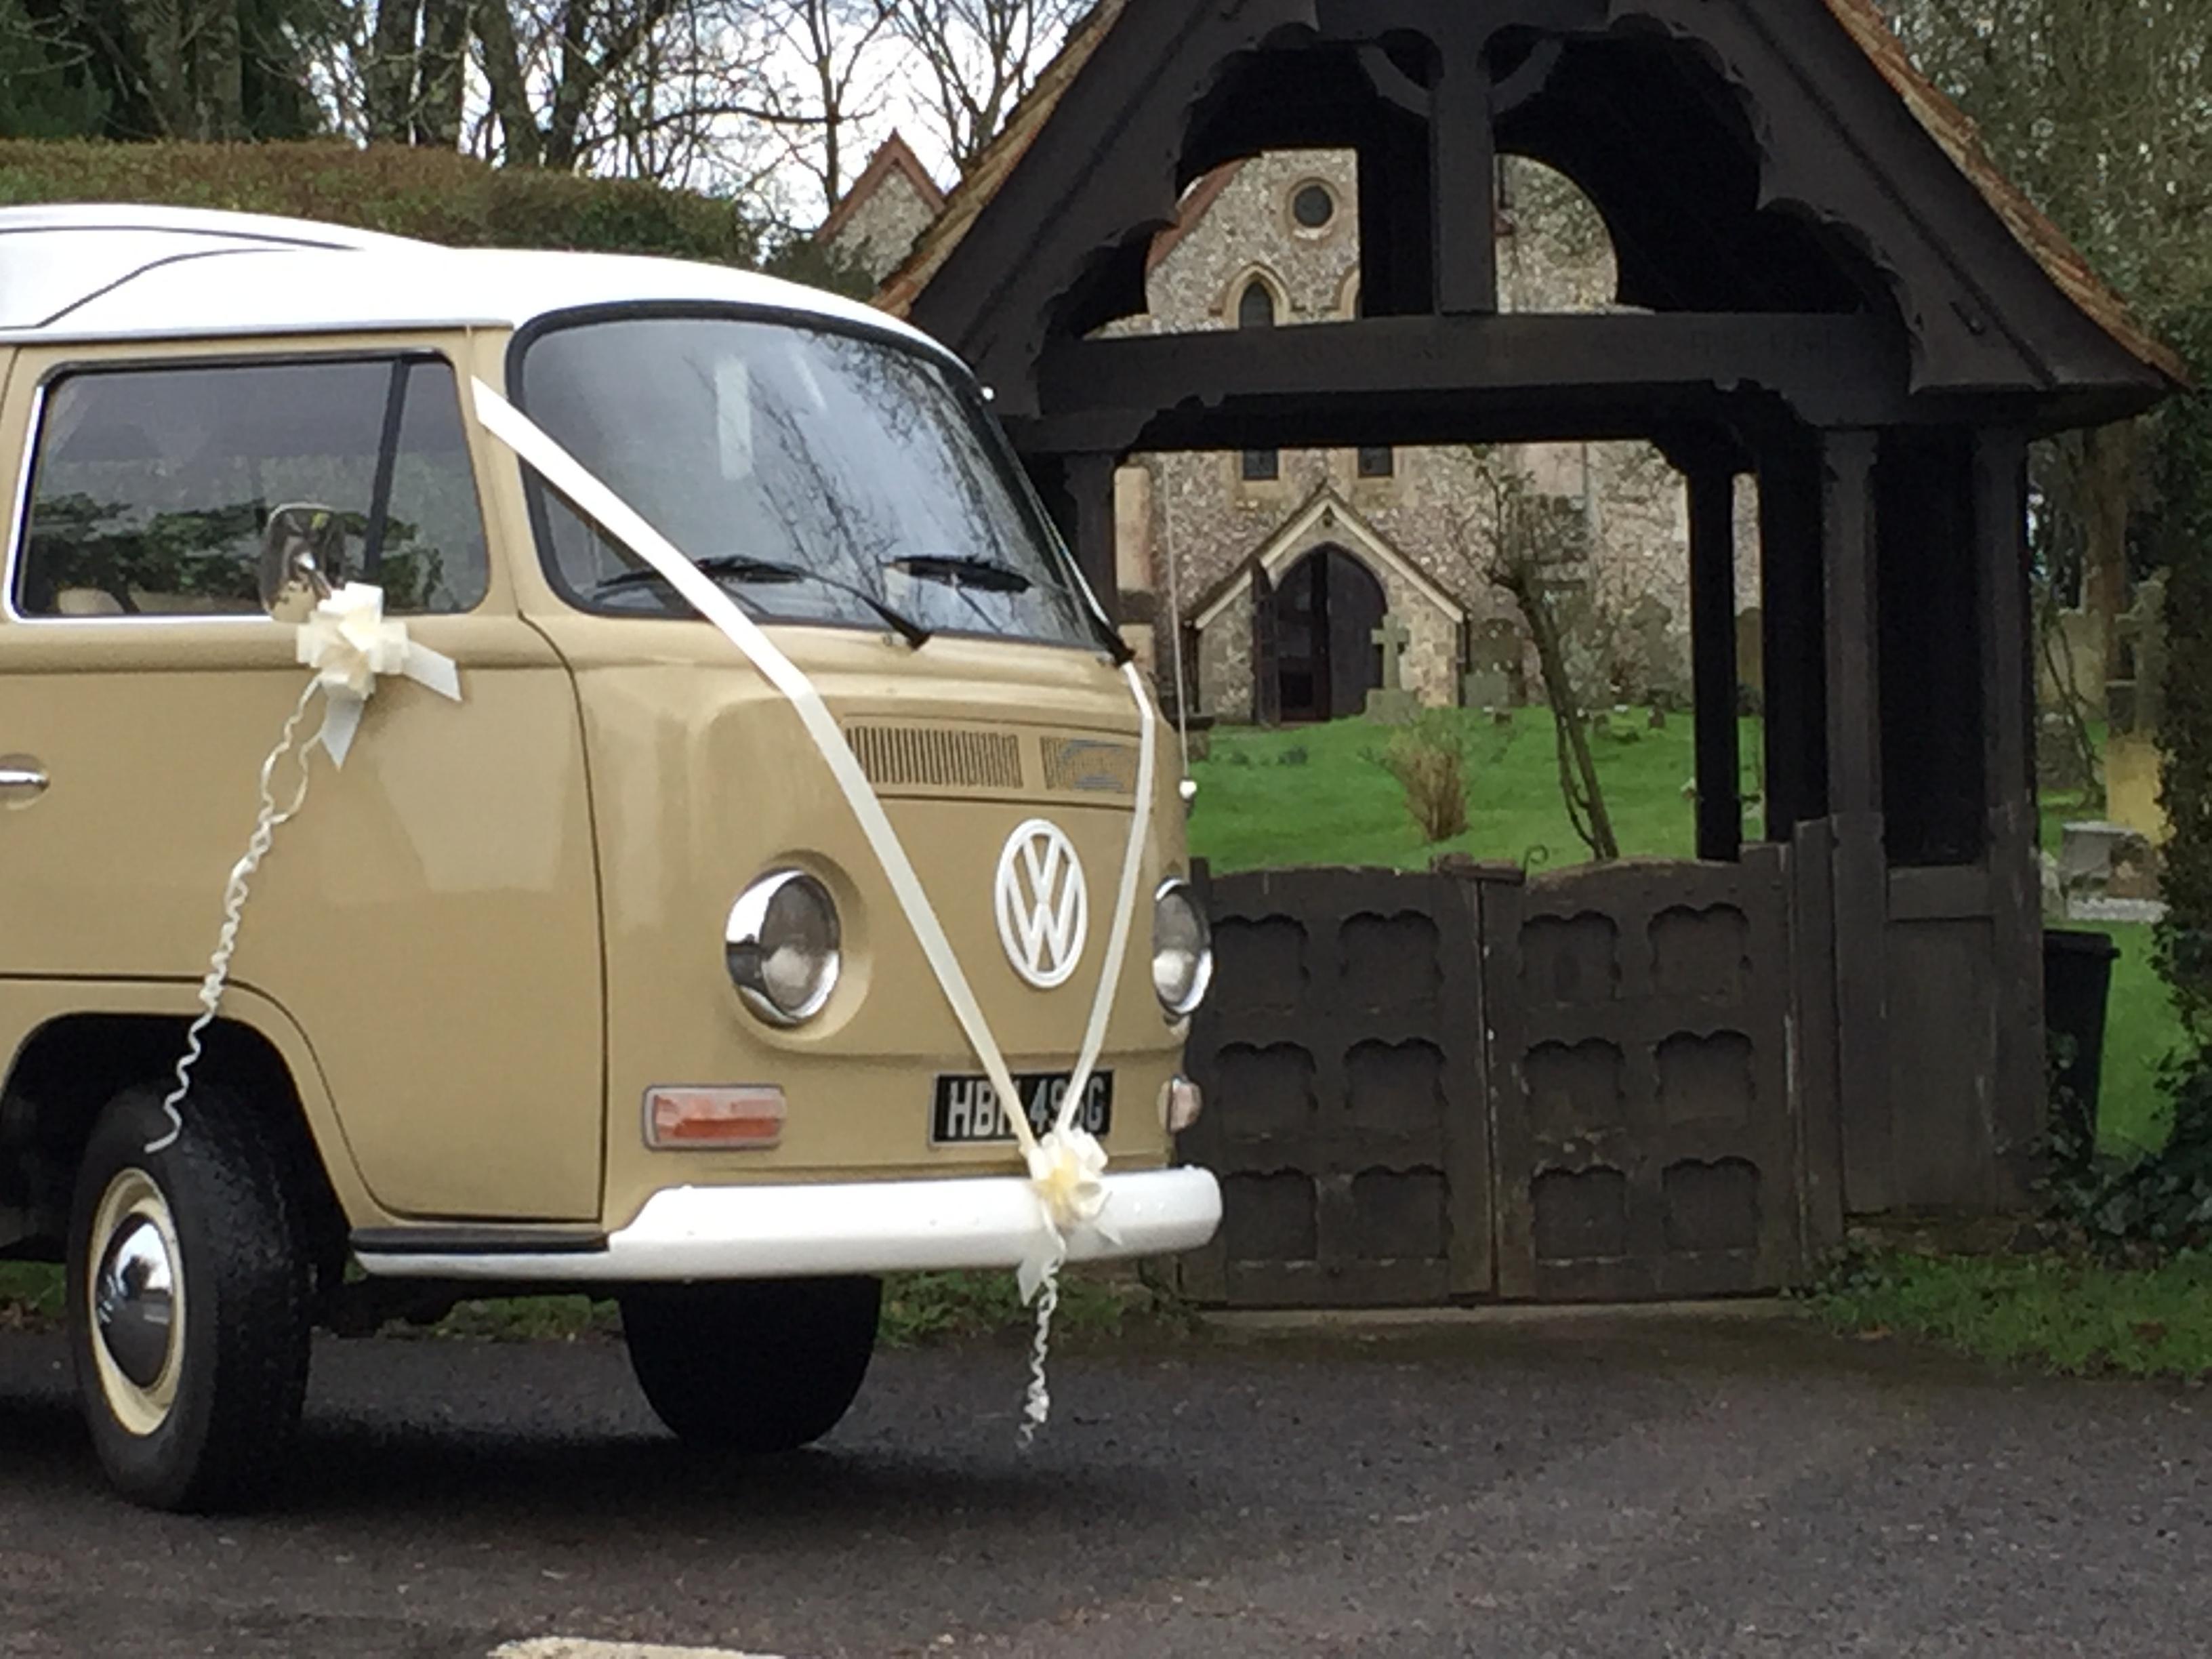 Sparky Vw Campervan Wedding Car Hire Covering Hampshire Surrey